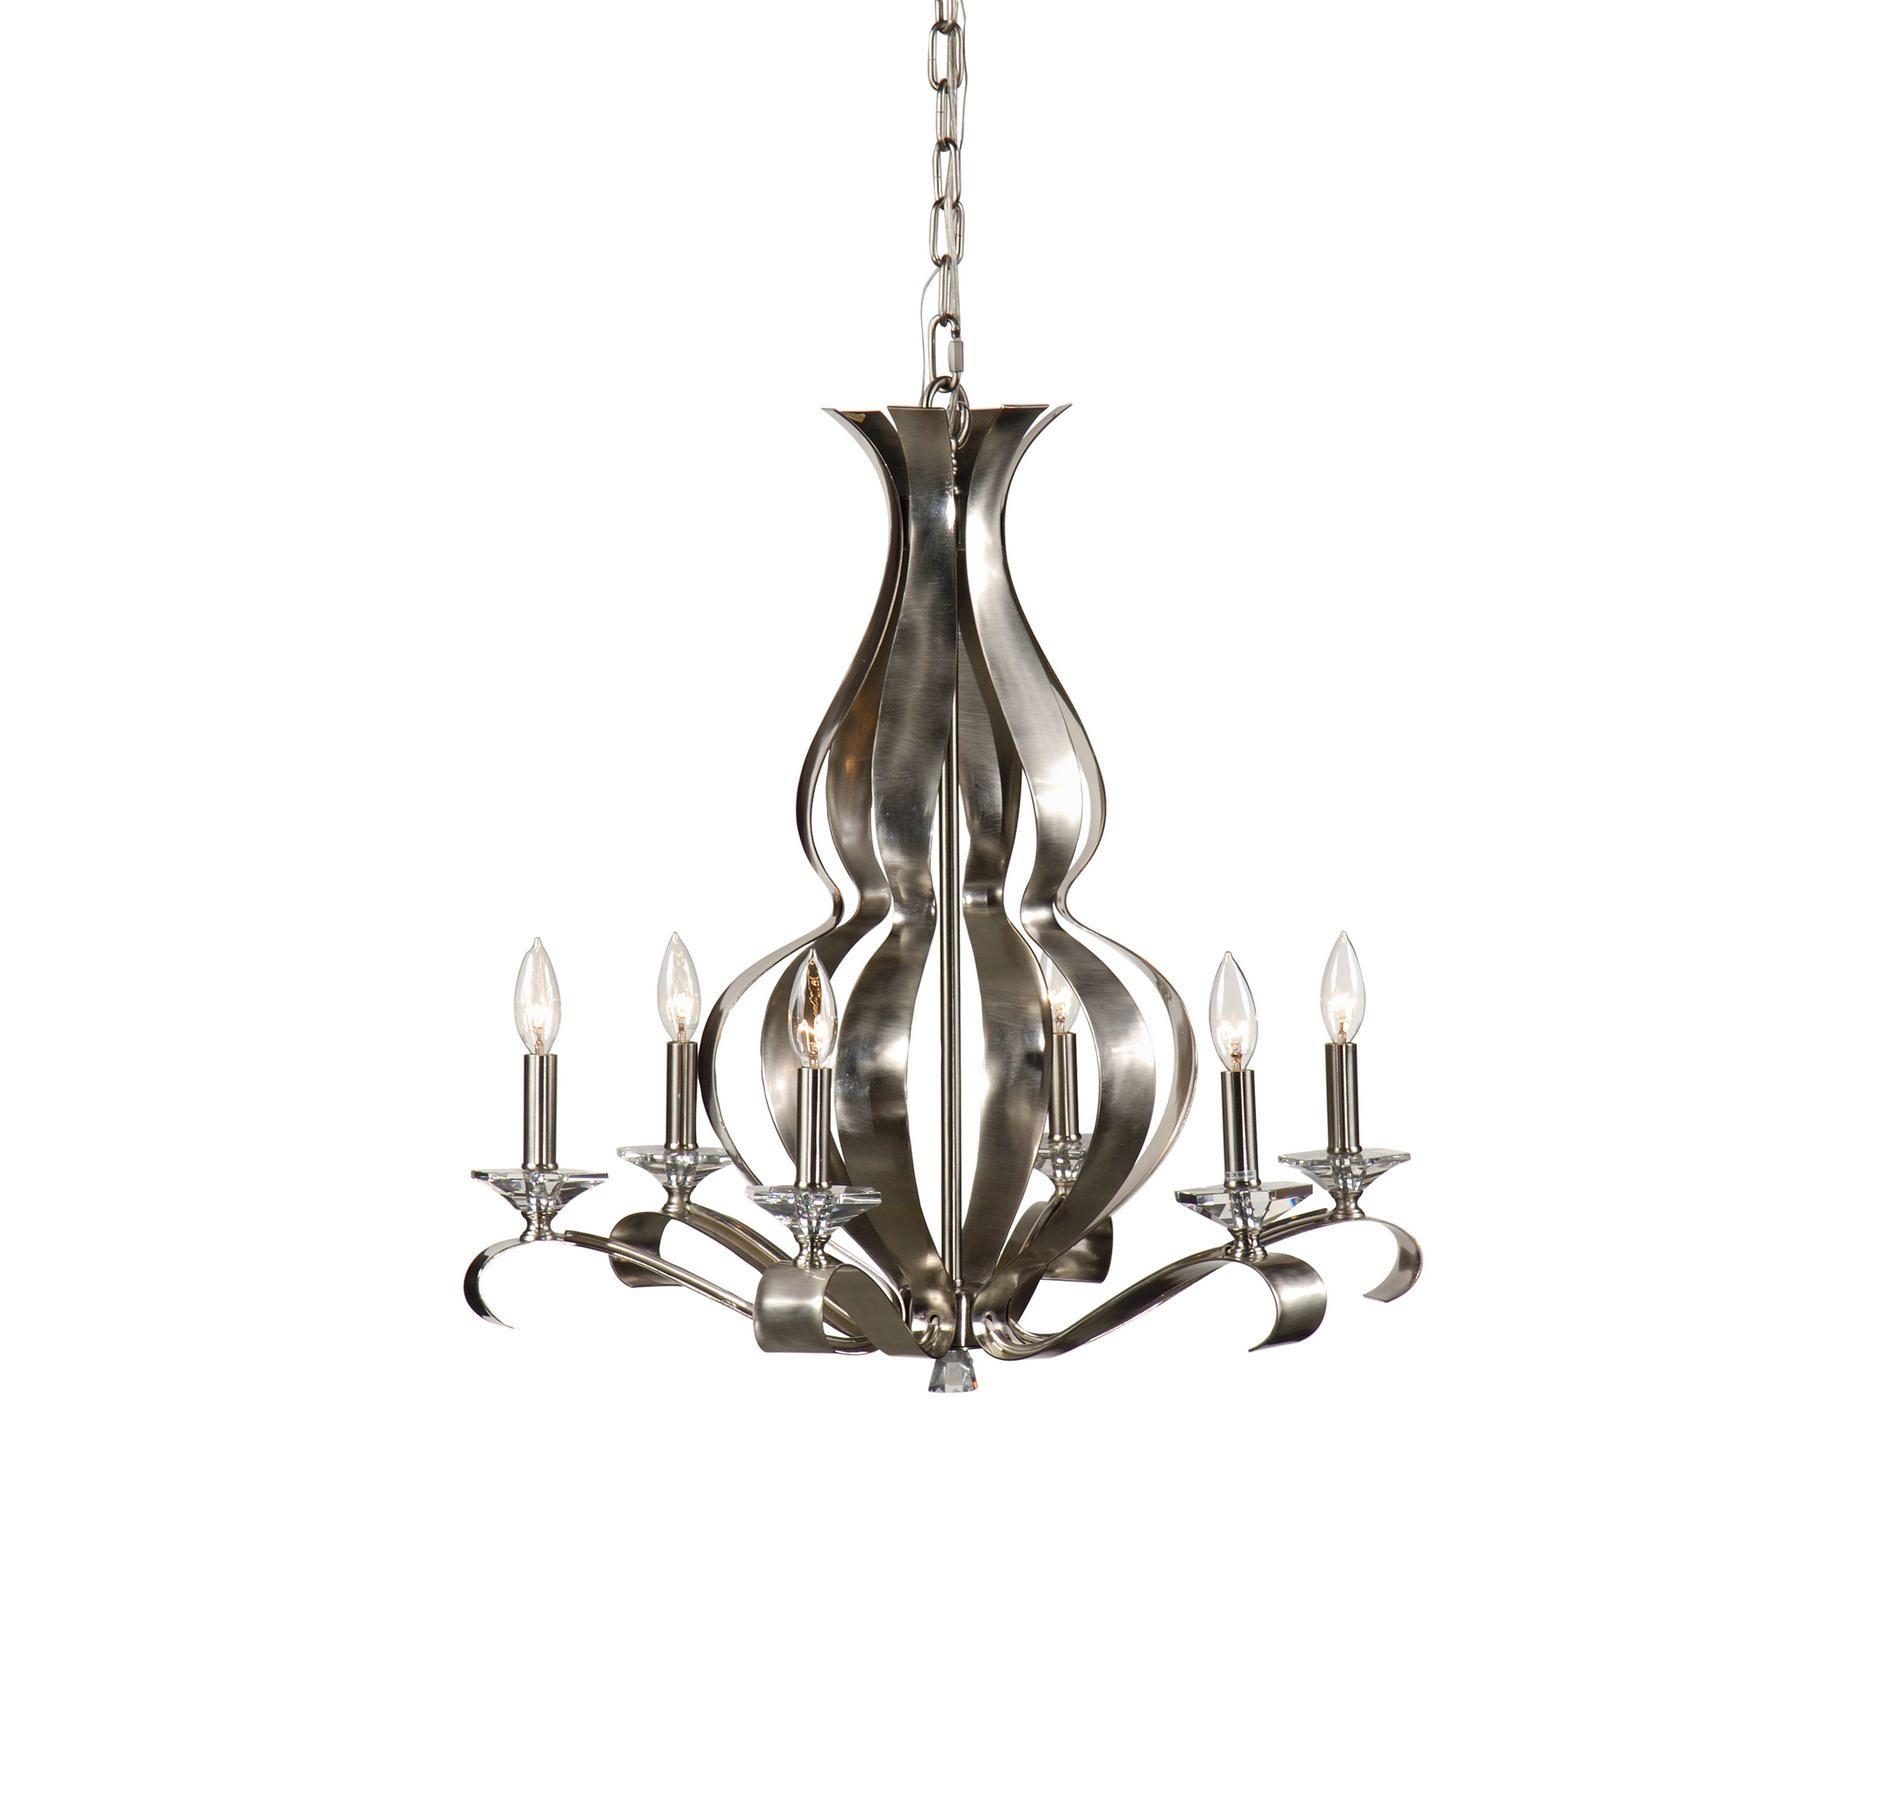 wildwood lamps ribbons chandelier in ceiling lights chandeliers